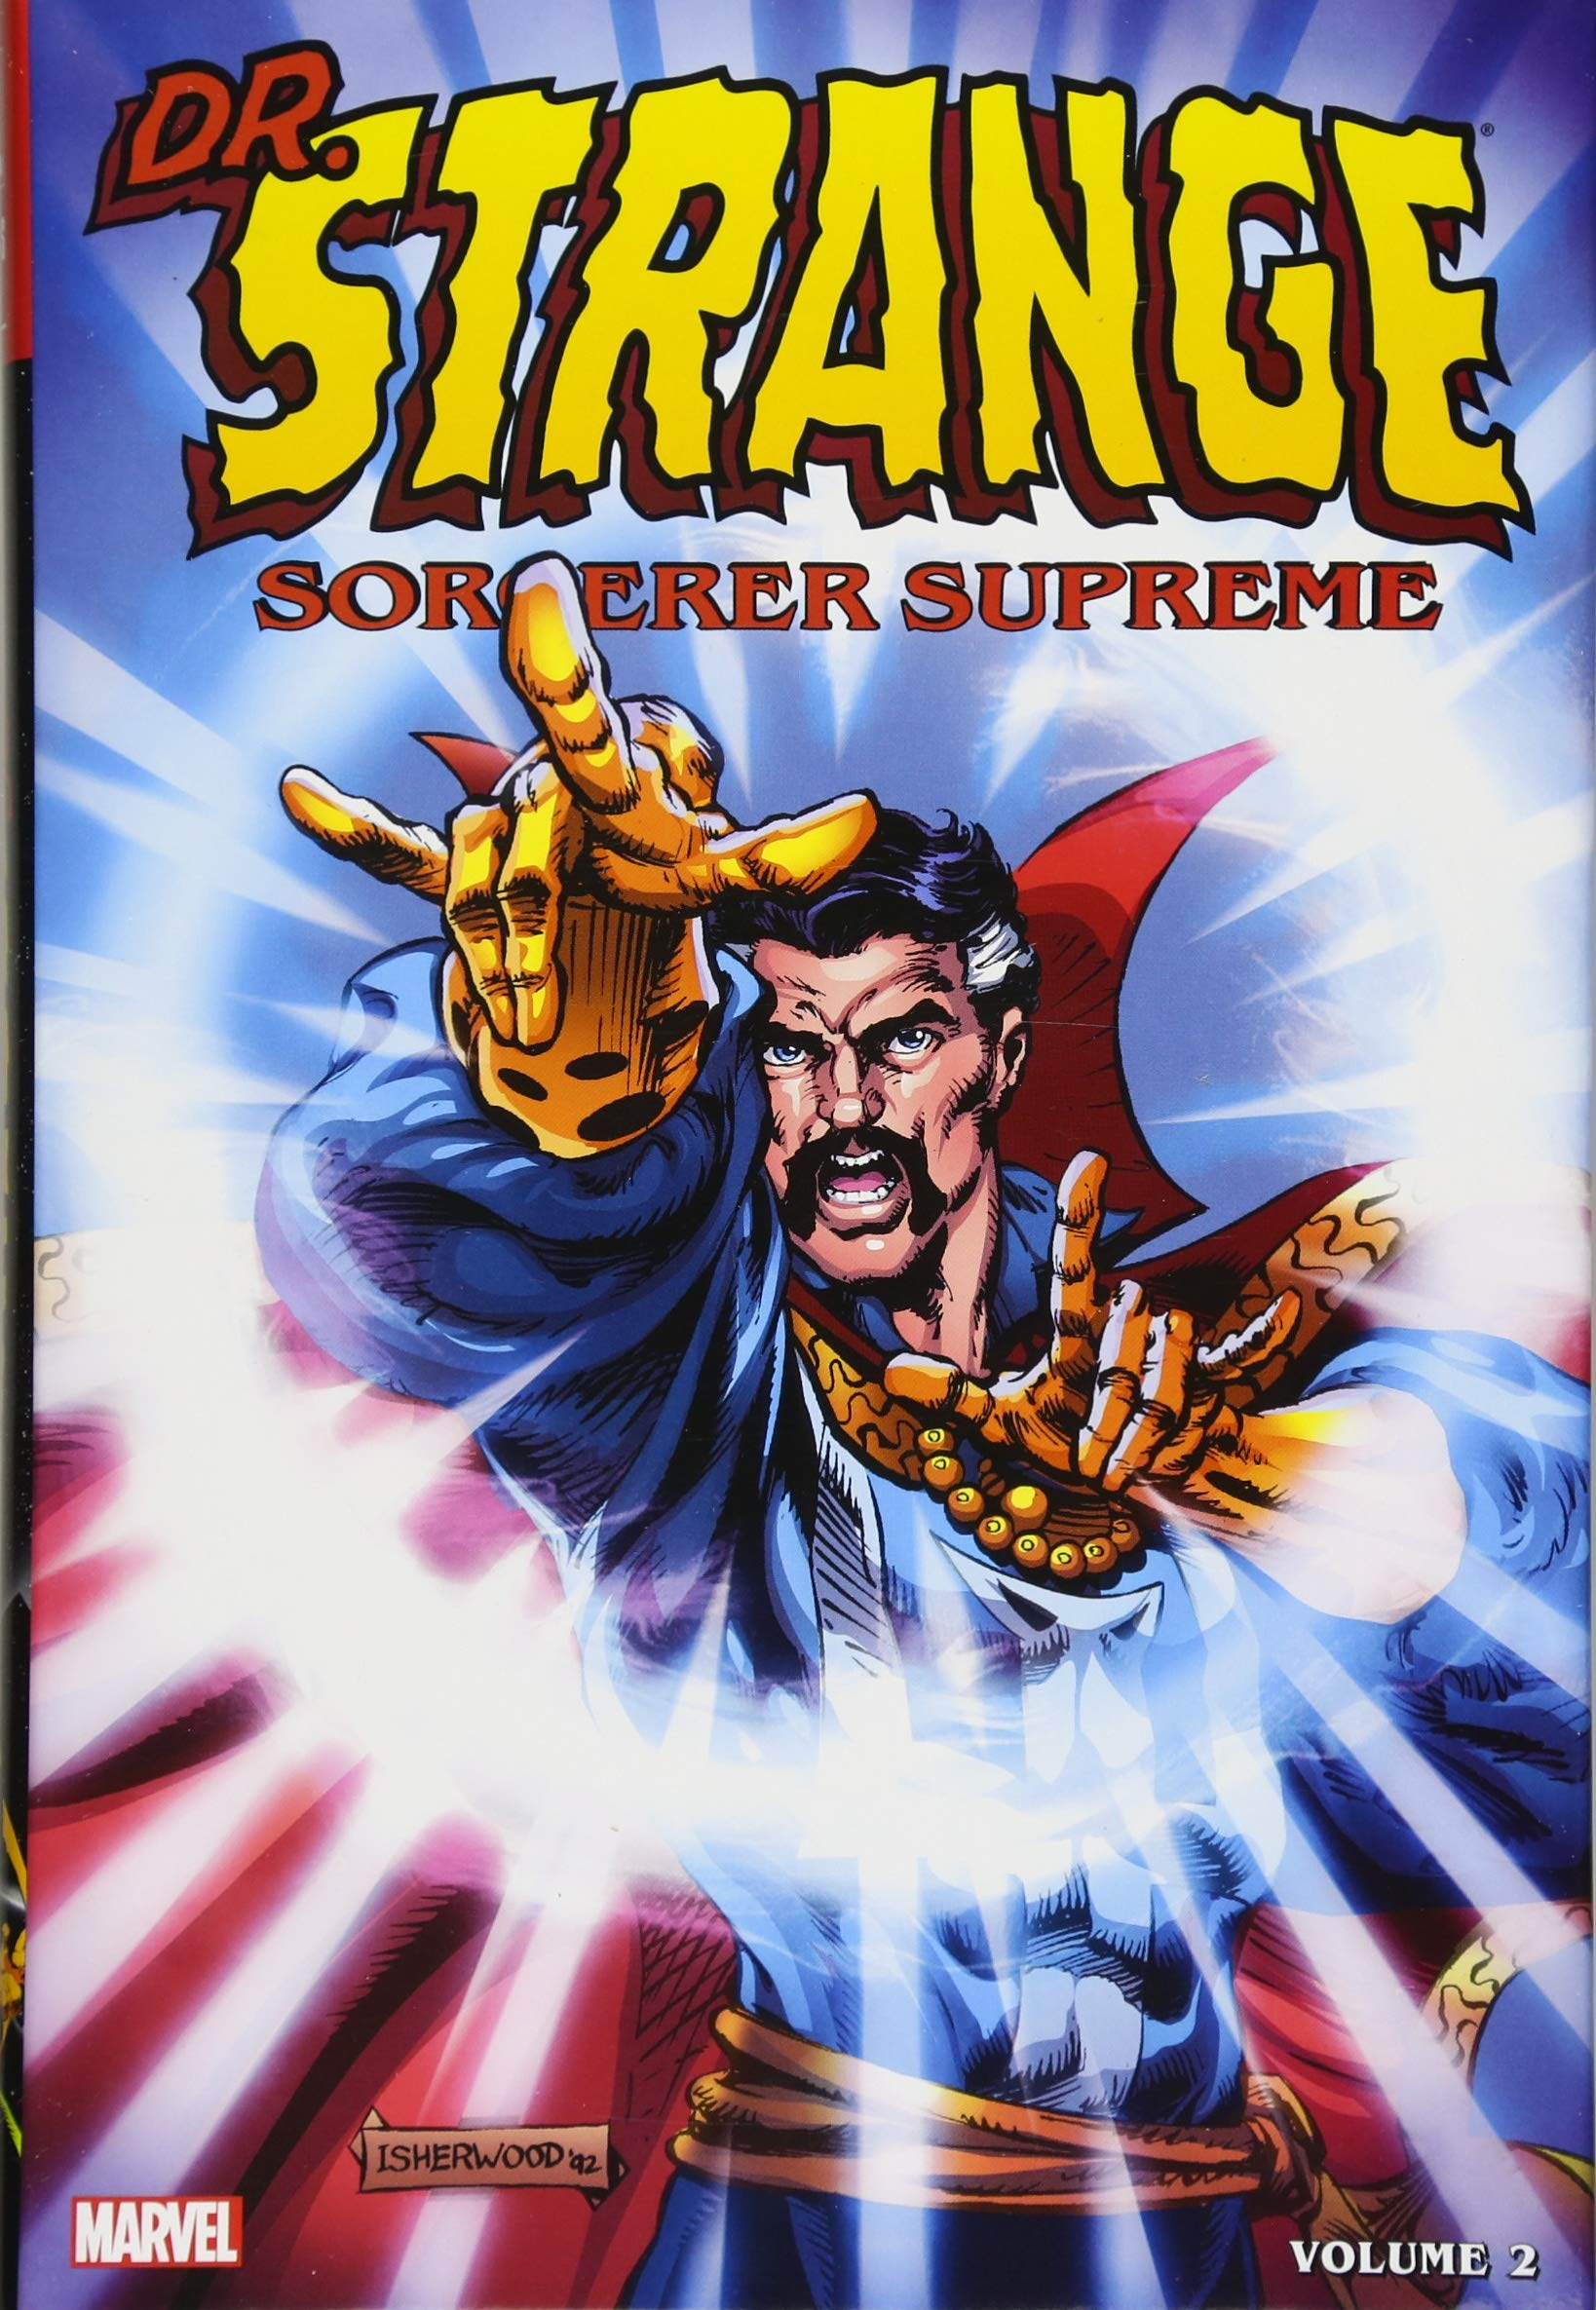 Thomas, R: Doctor Strange, Sorcerer Supreme Omnibus Vol. 2: Amazon ...